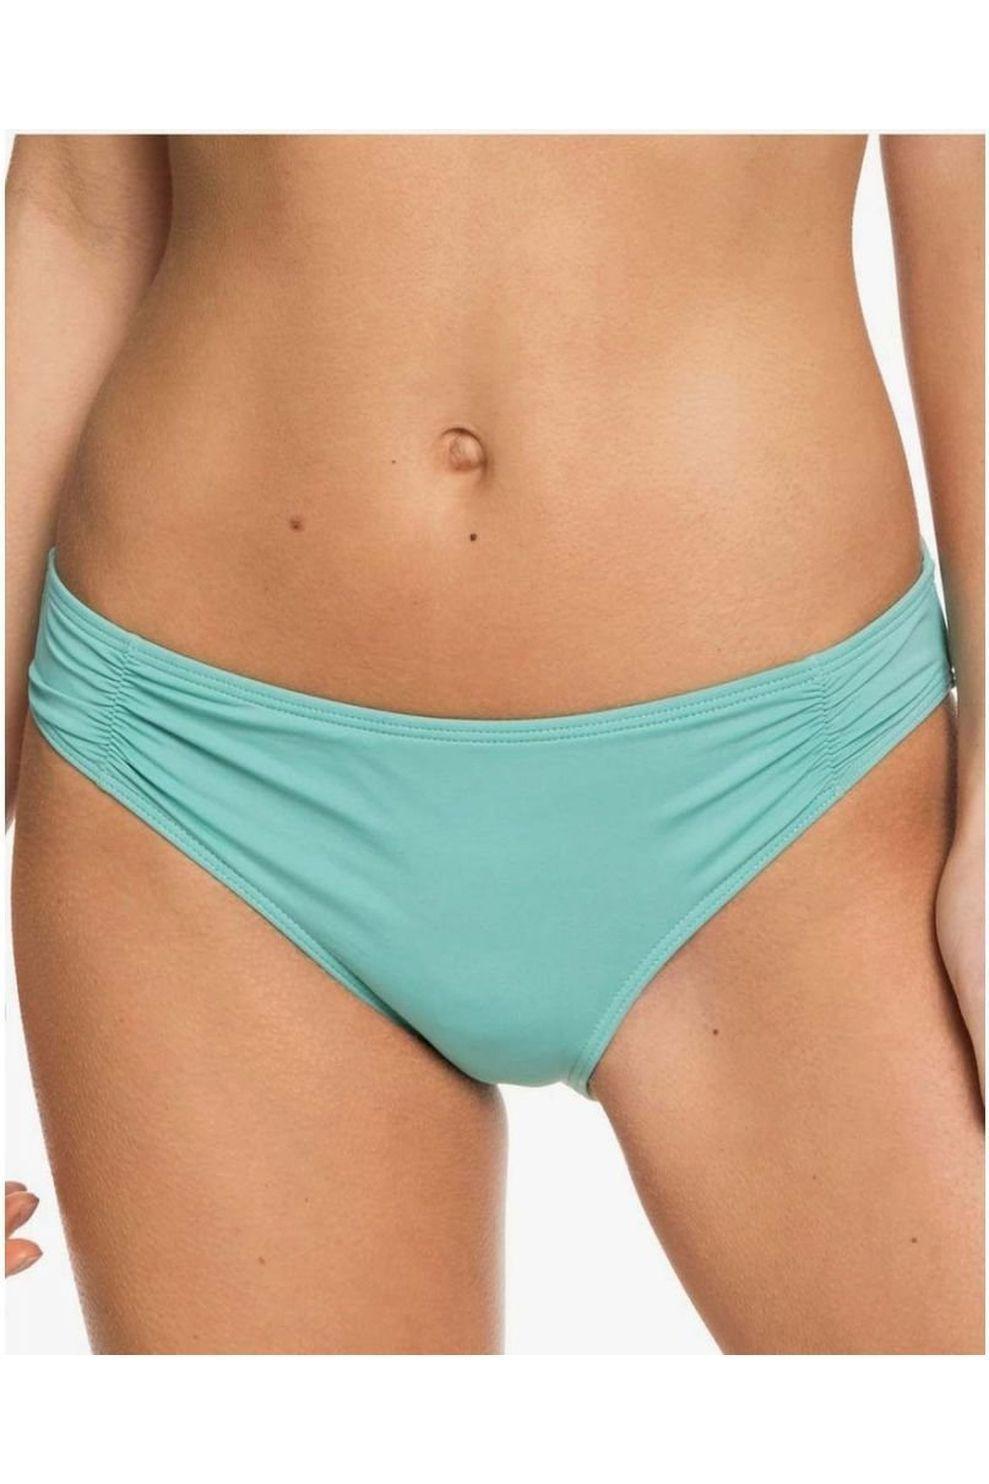 Roxy Slip Sd Beach Classics Full voor dames - Groen - Maten: S, L, XL